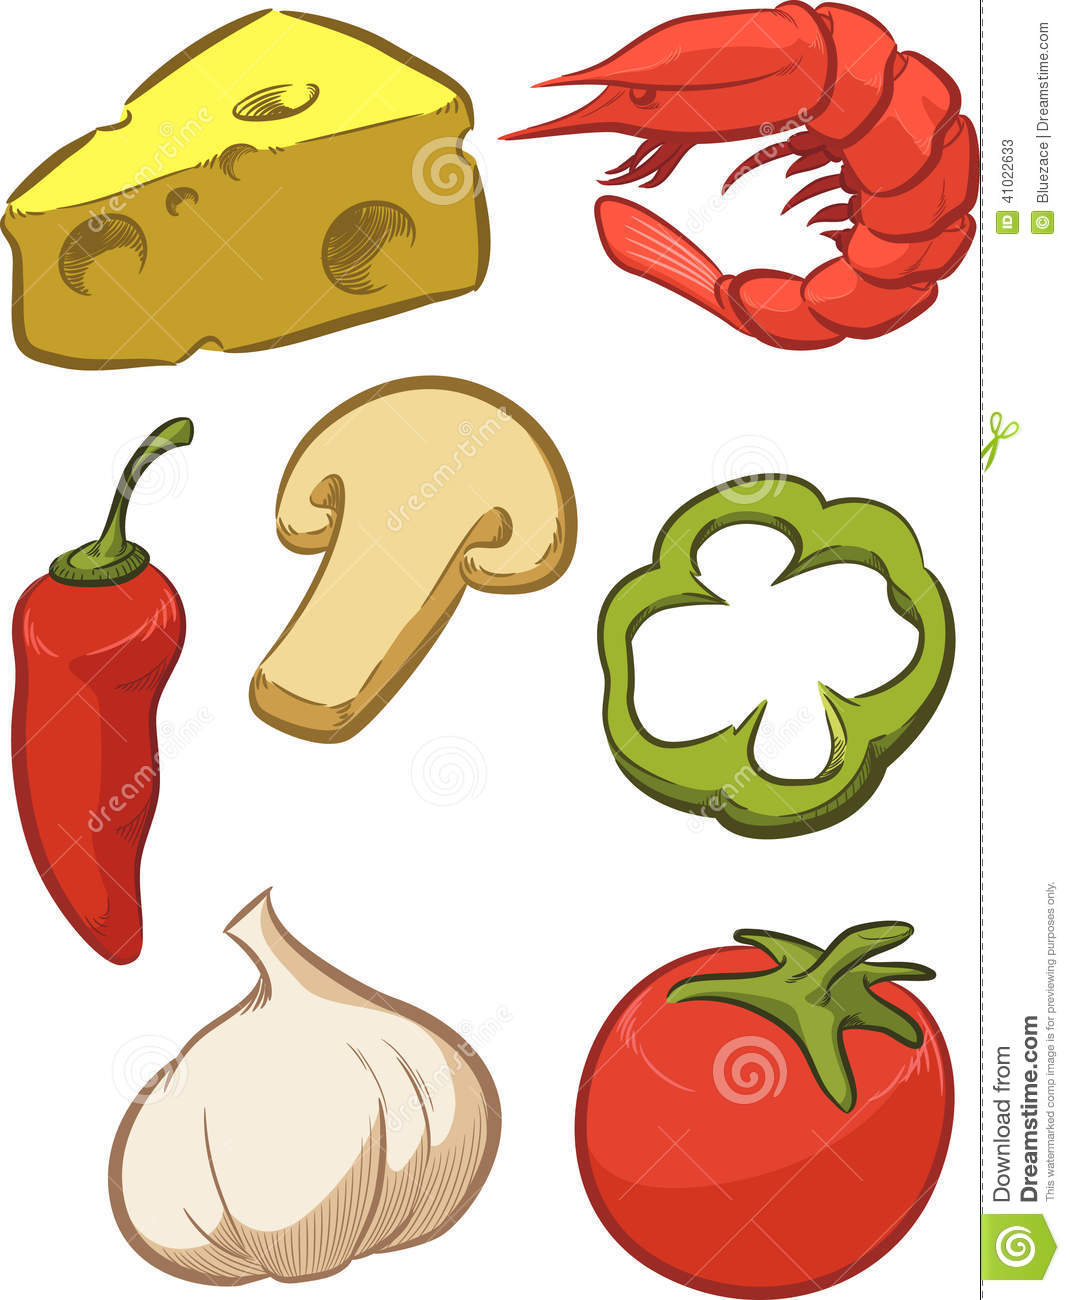 Pizza Ingredient - Tomato .-Pizza Ingredient - Tomato .-3